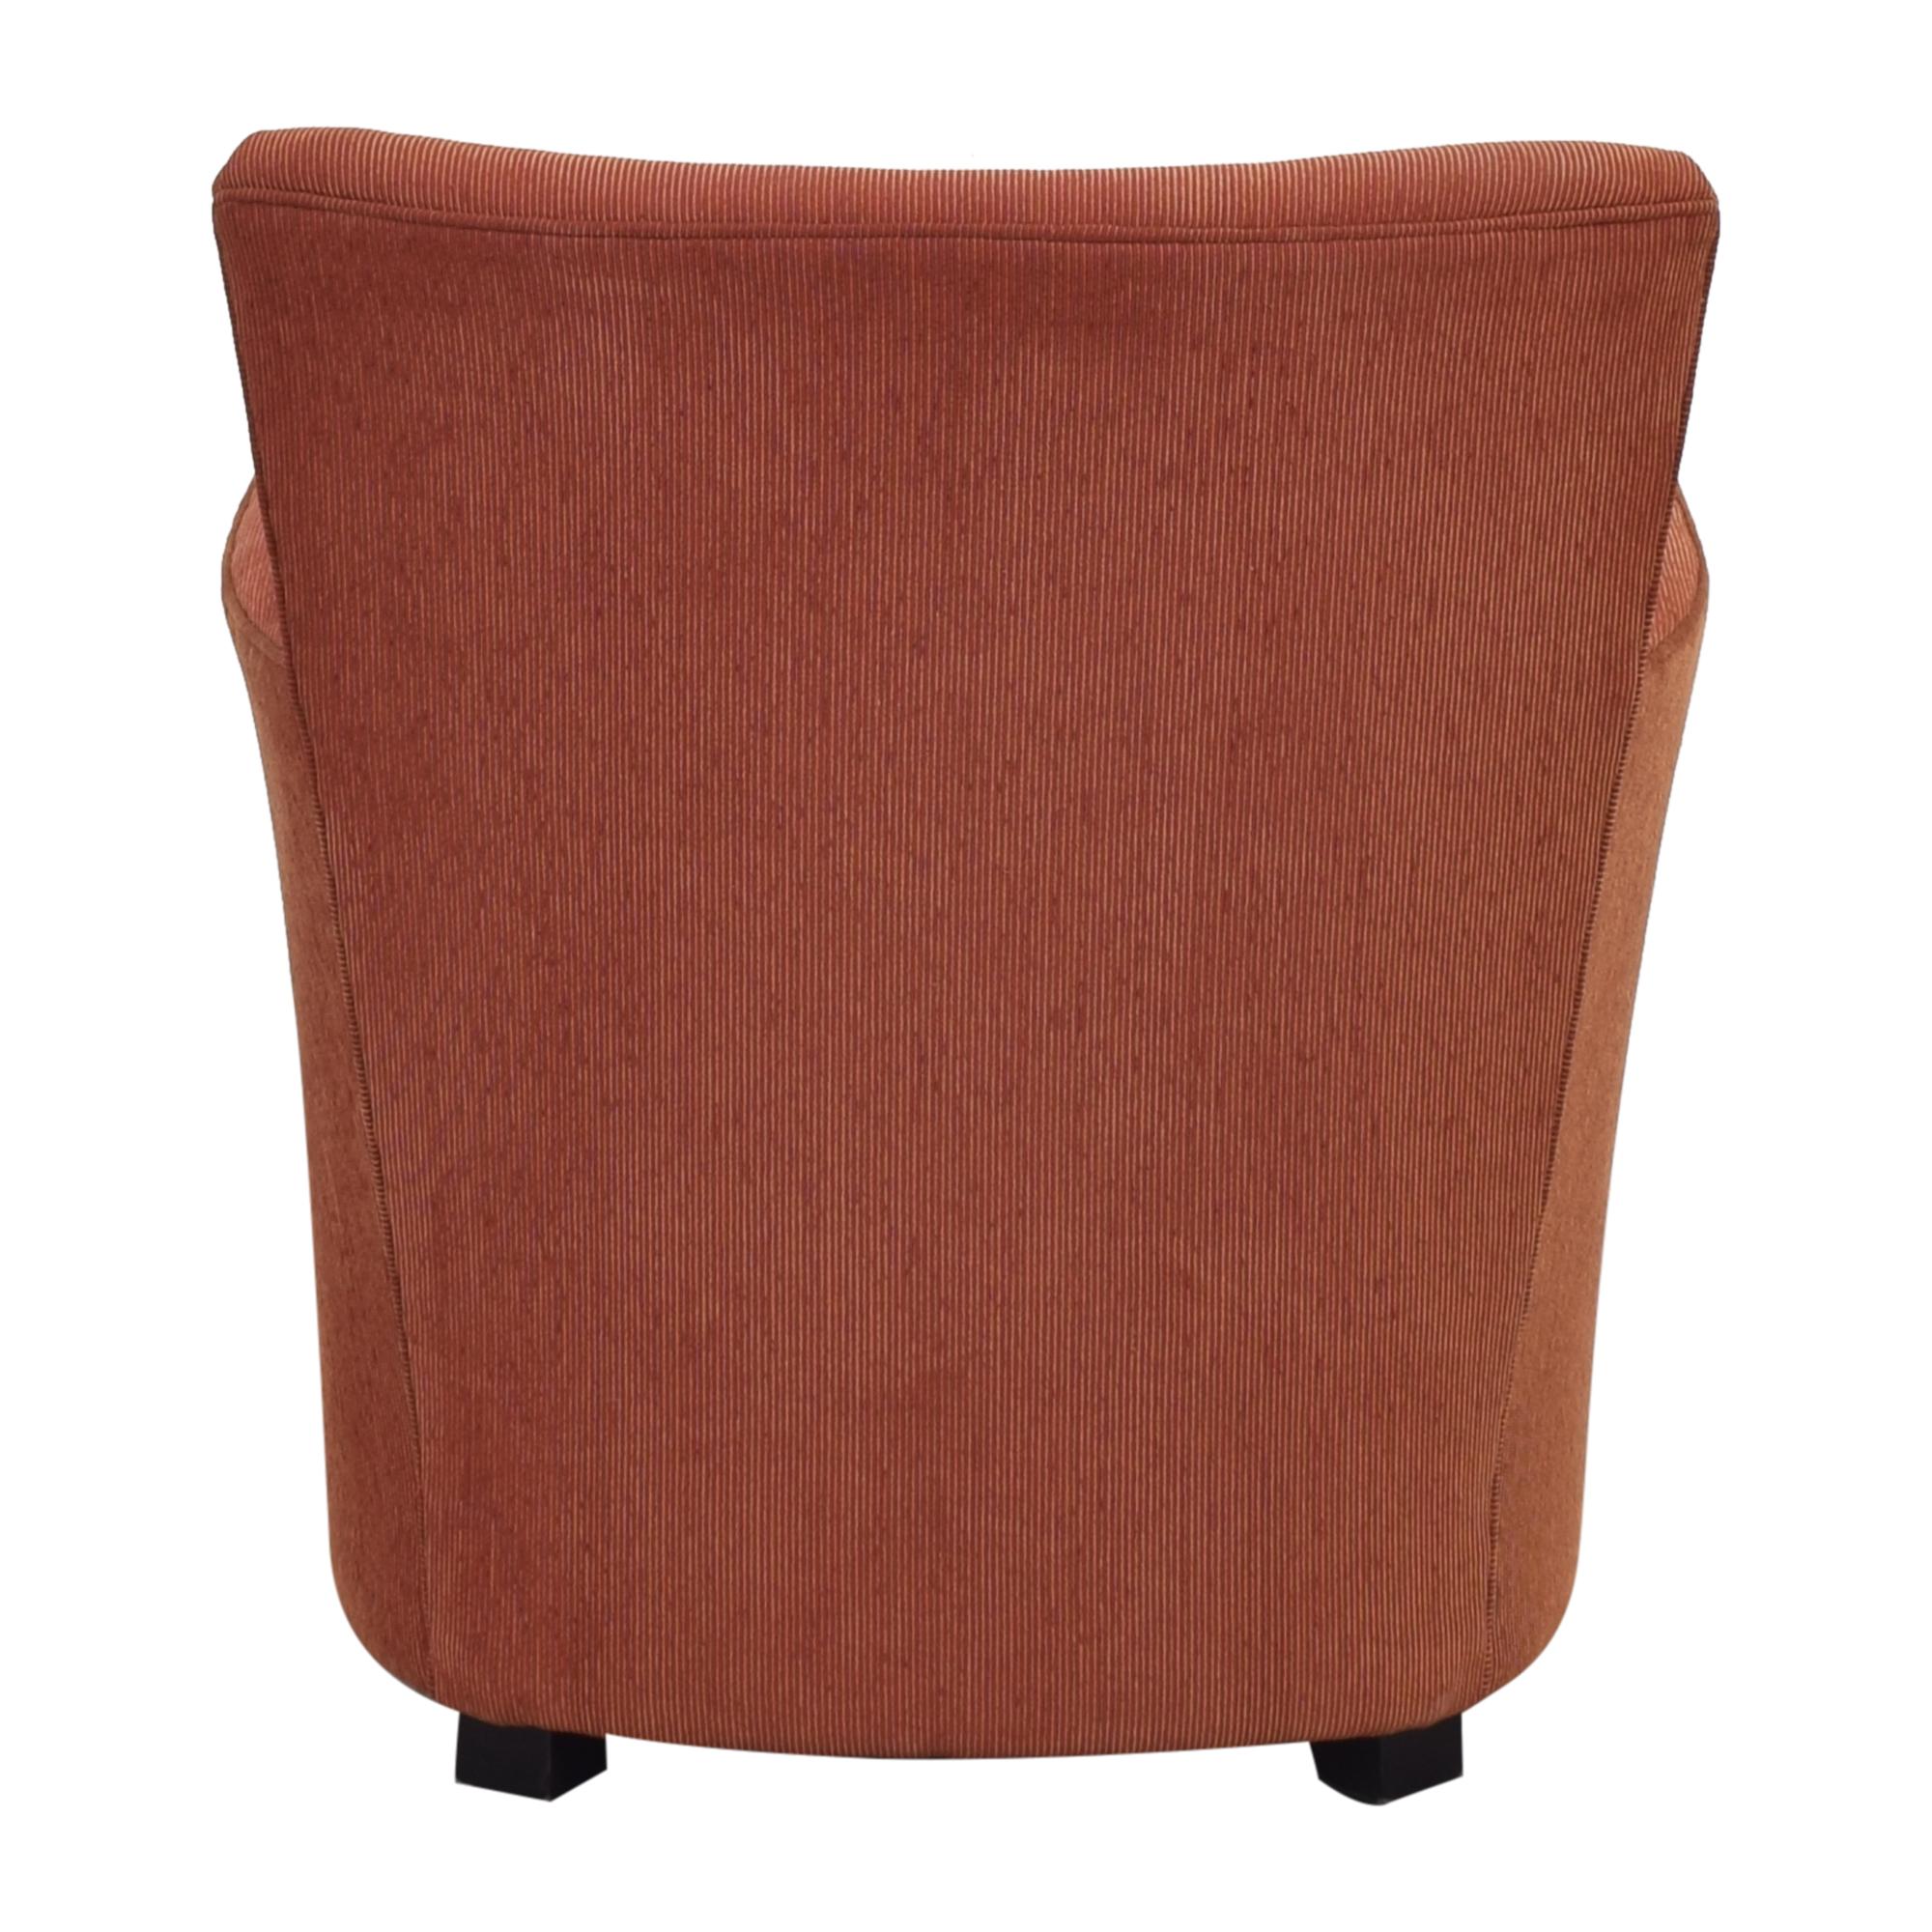 Crate & Barrel Crate & Barrel Accent Chair second hand